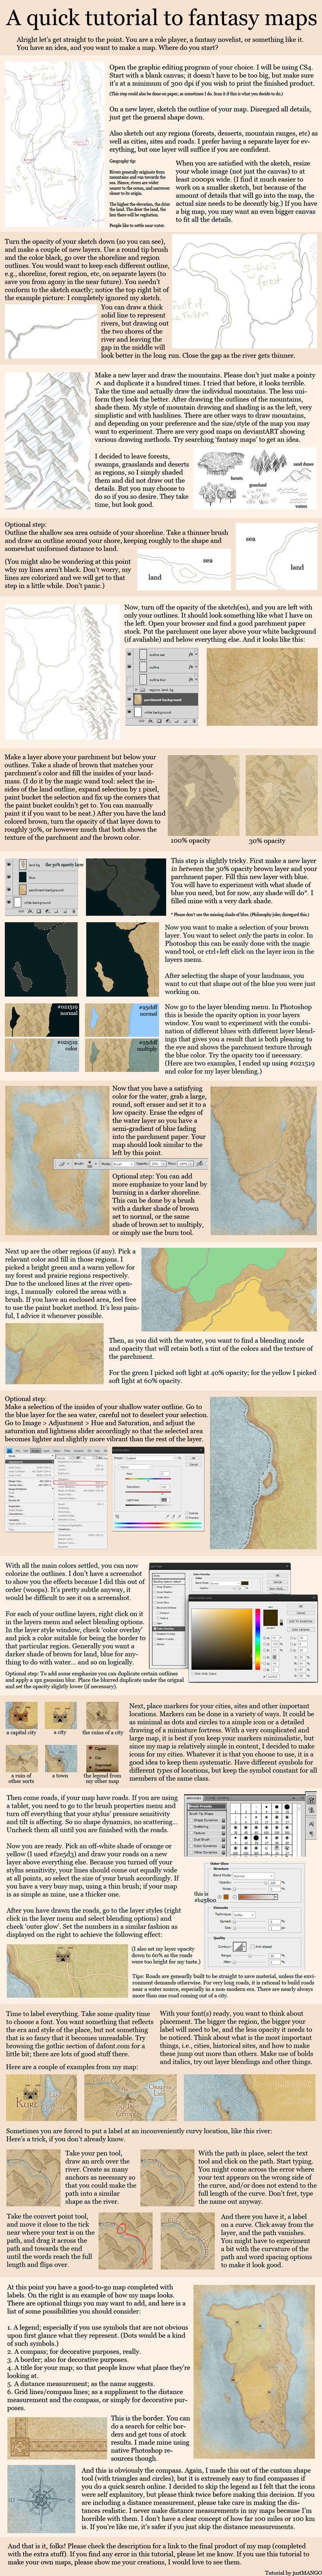 Fantasy Maps tutorial start to finish